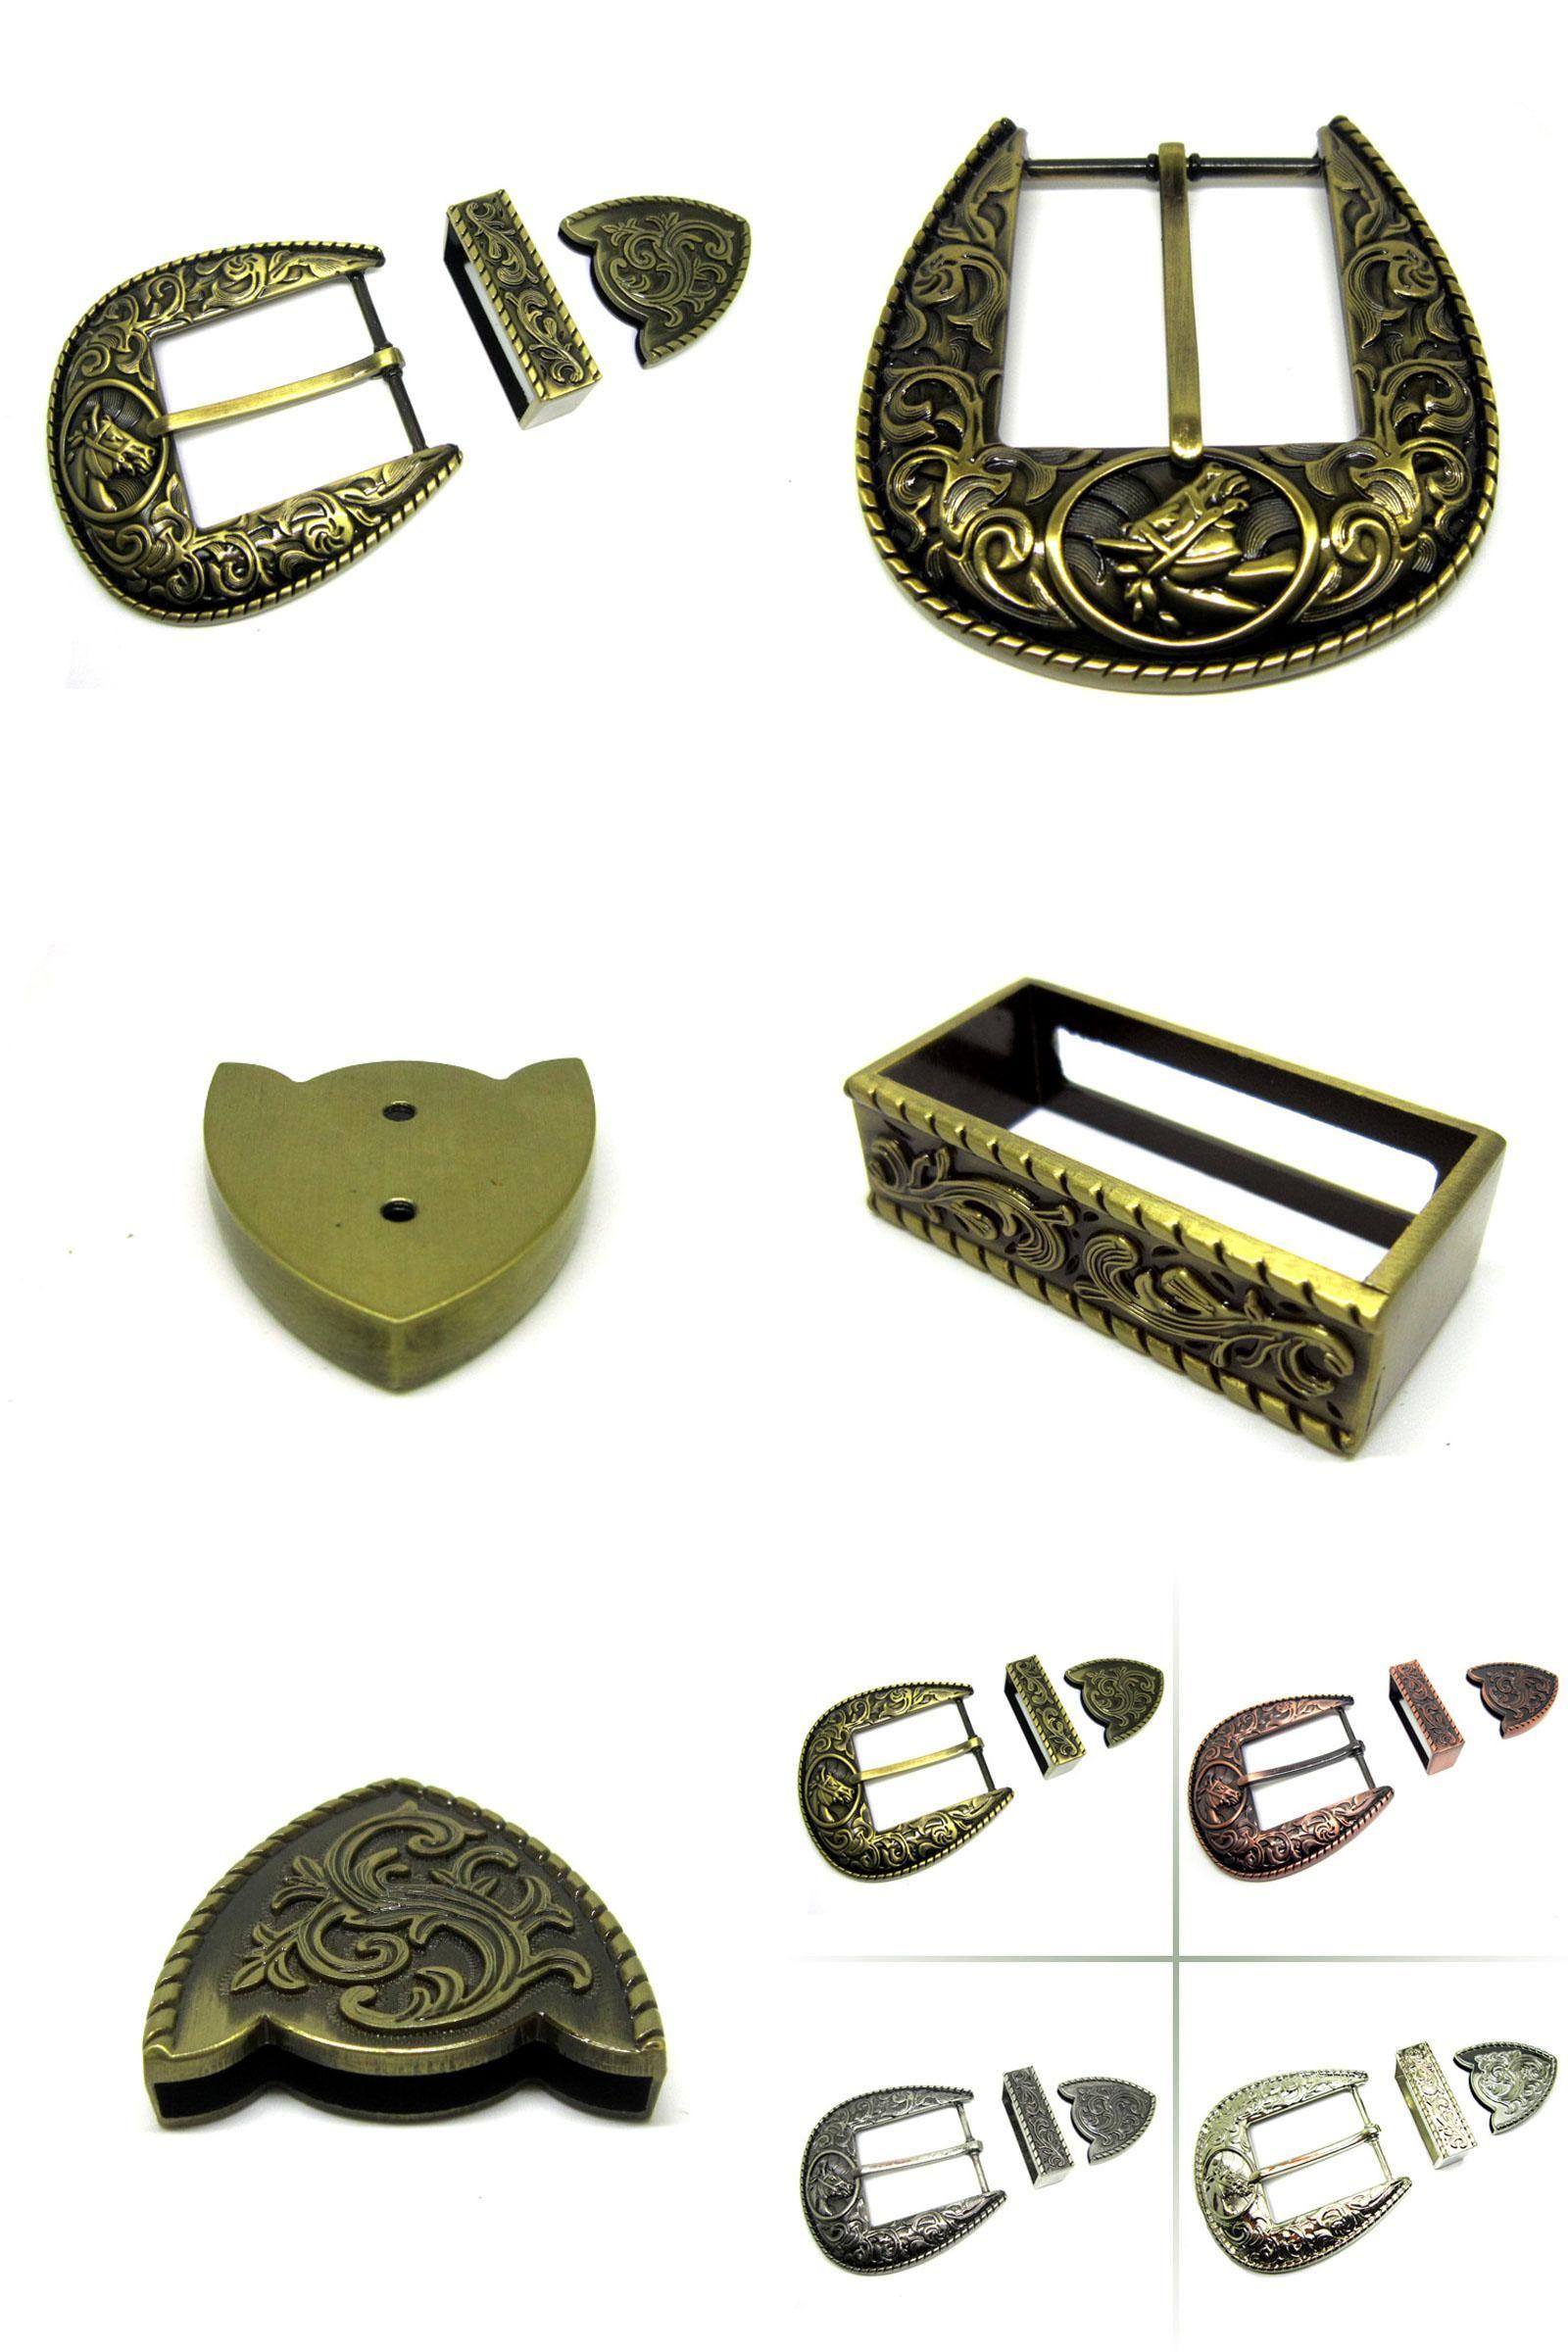 [Visit to Buy] T-Disom New Men U-horsehead Belt Buckle Hot Selling DIY Belt Buckles 2016 Suitable For 4cm Width Belt Drop ship DS16-277 #Advertisement